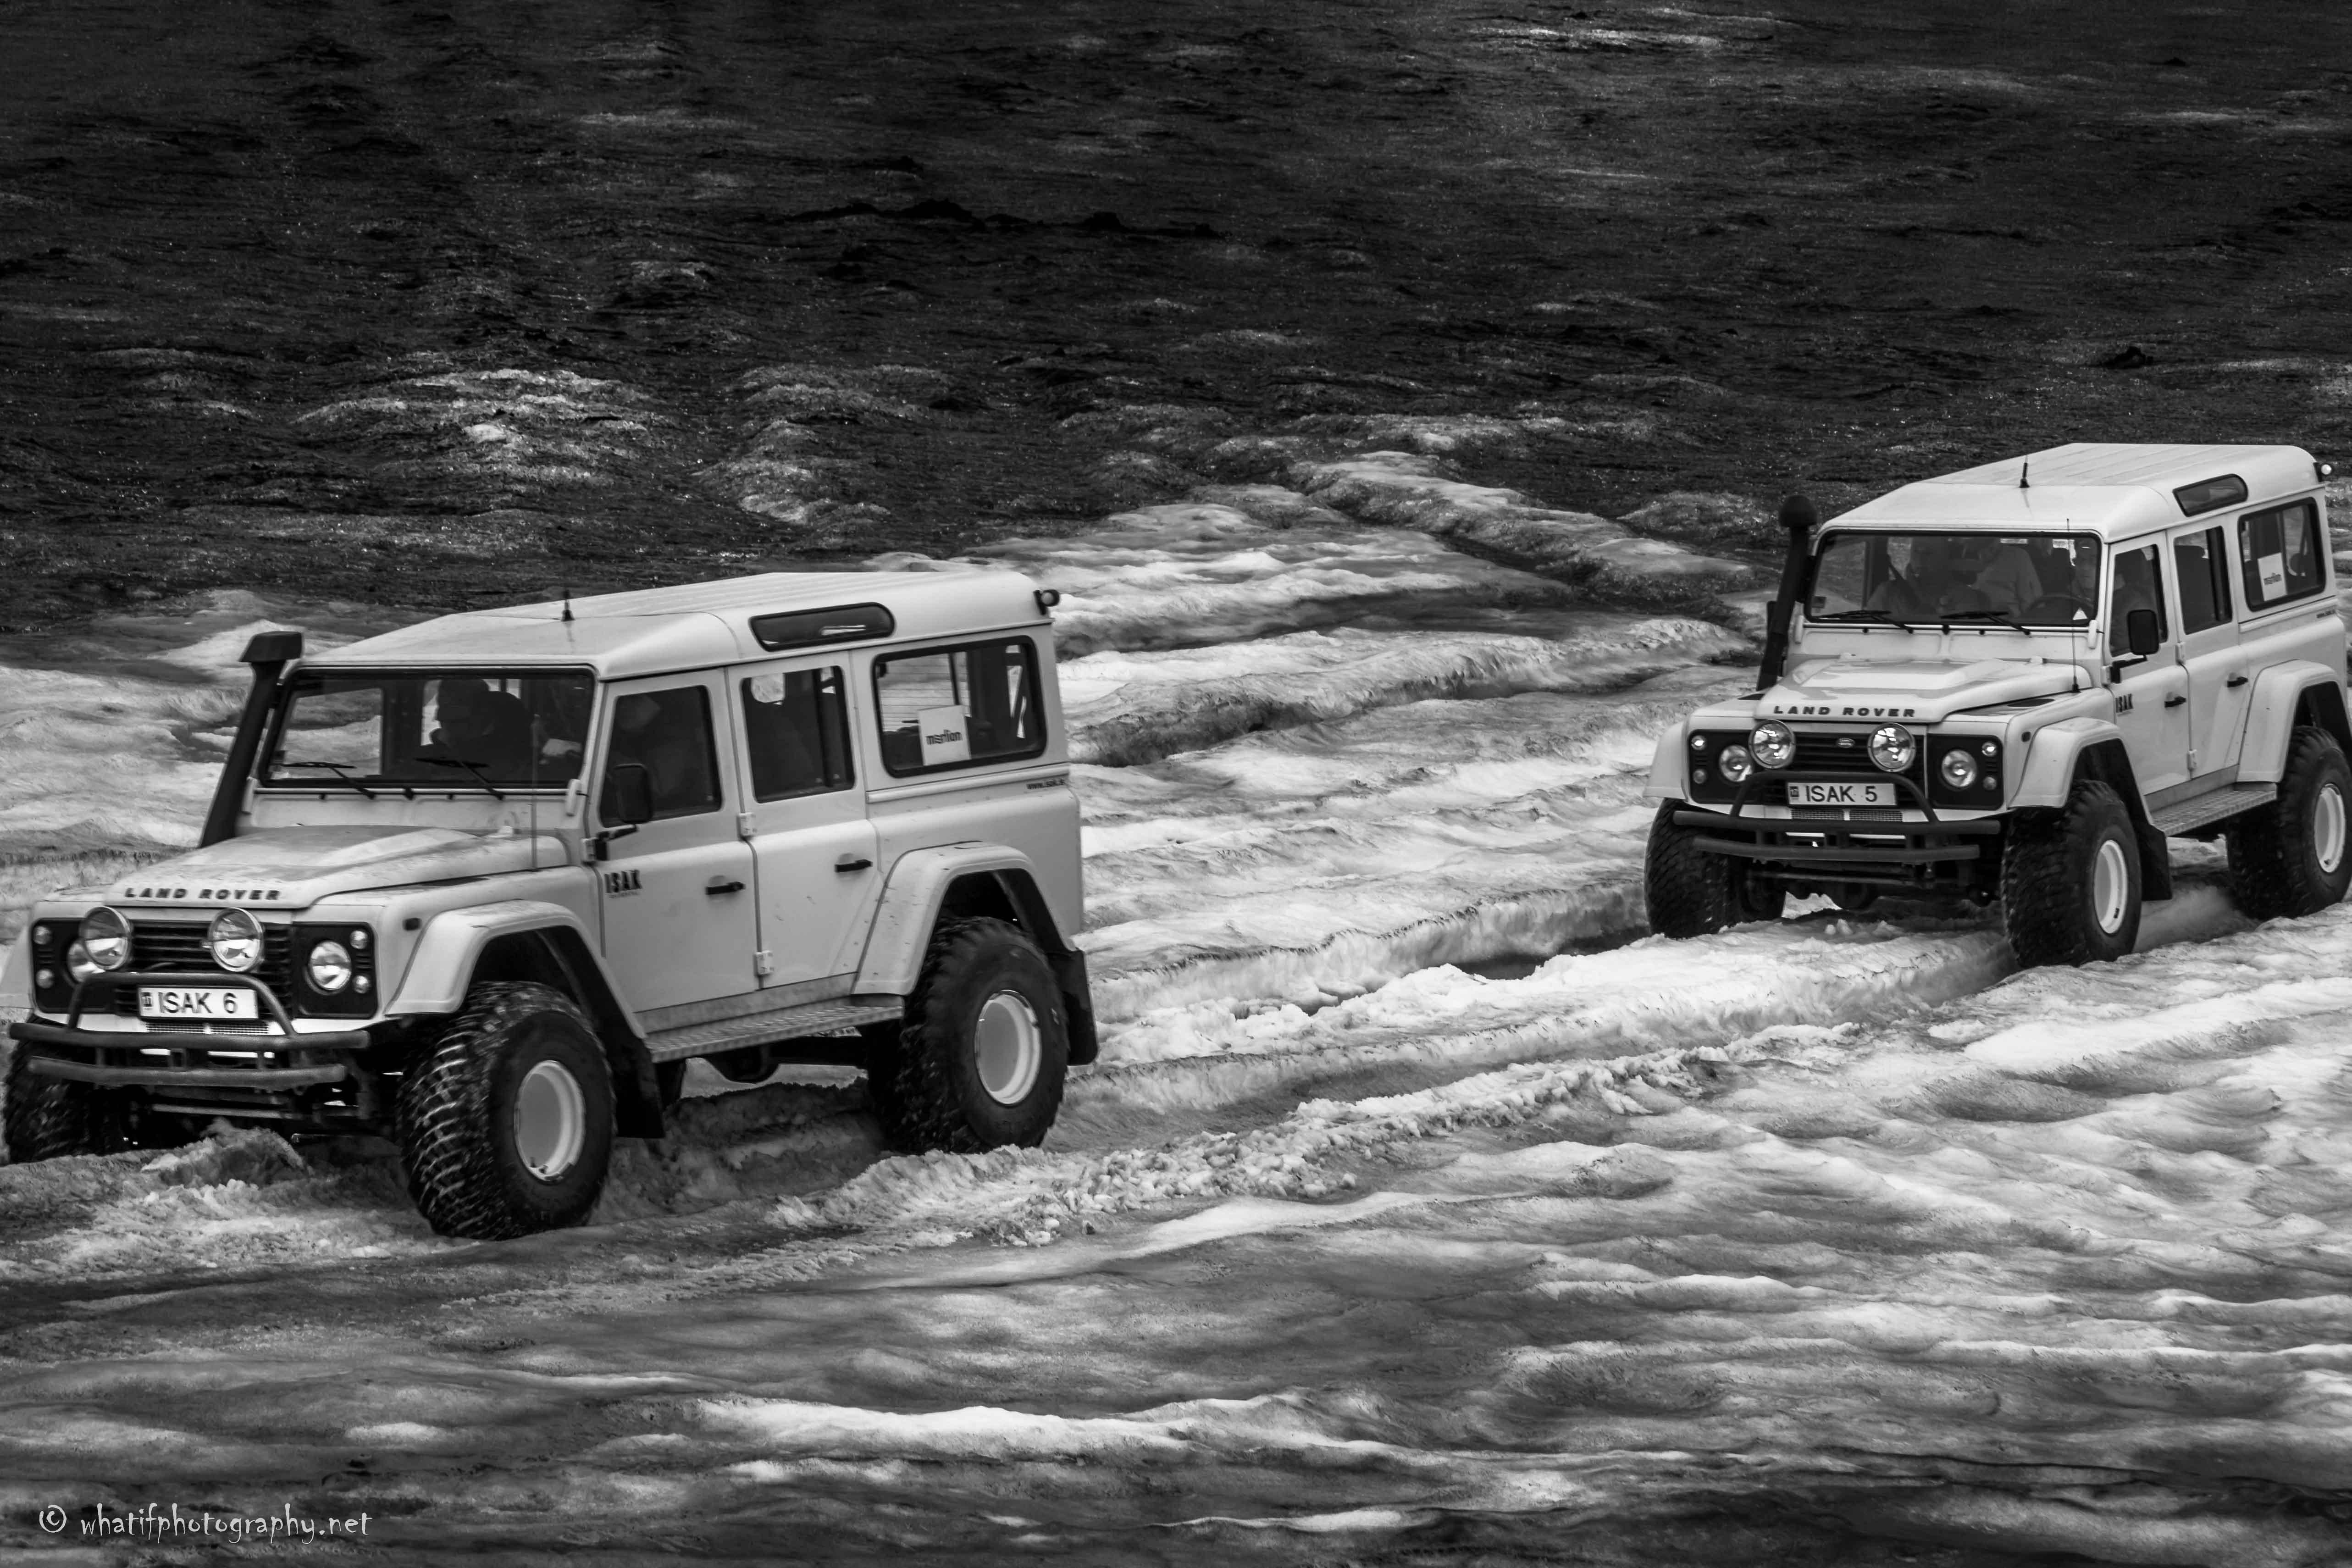 Langjökull_glacier_jeep_expedition